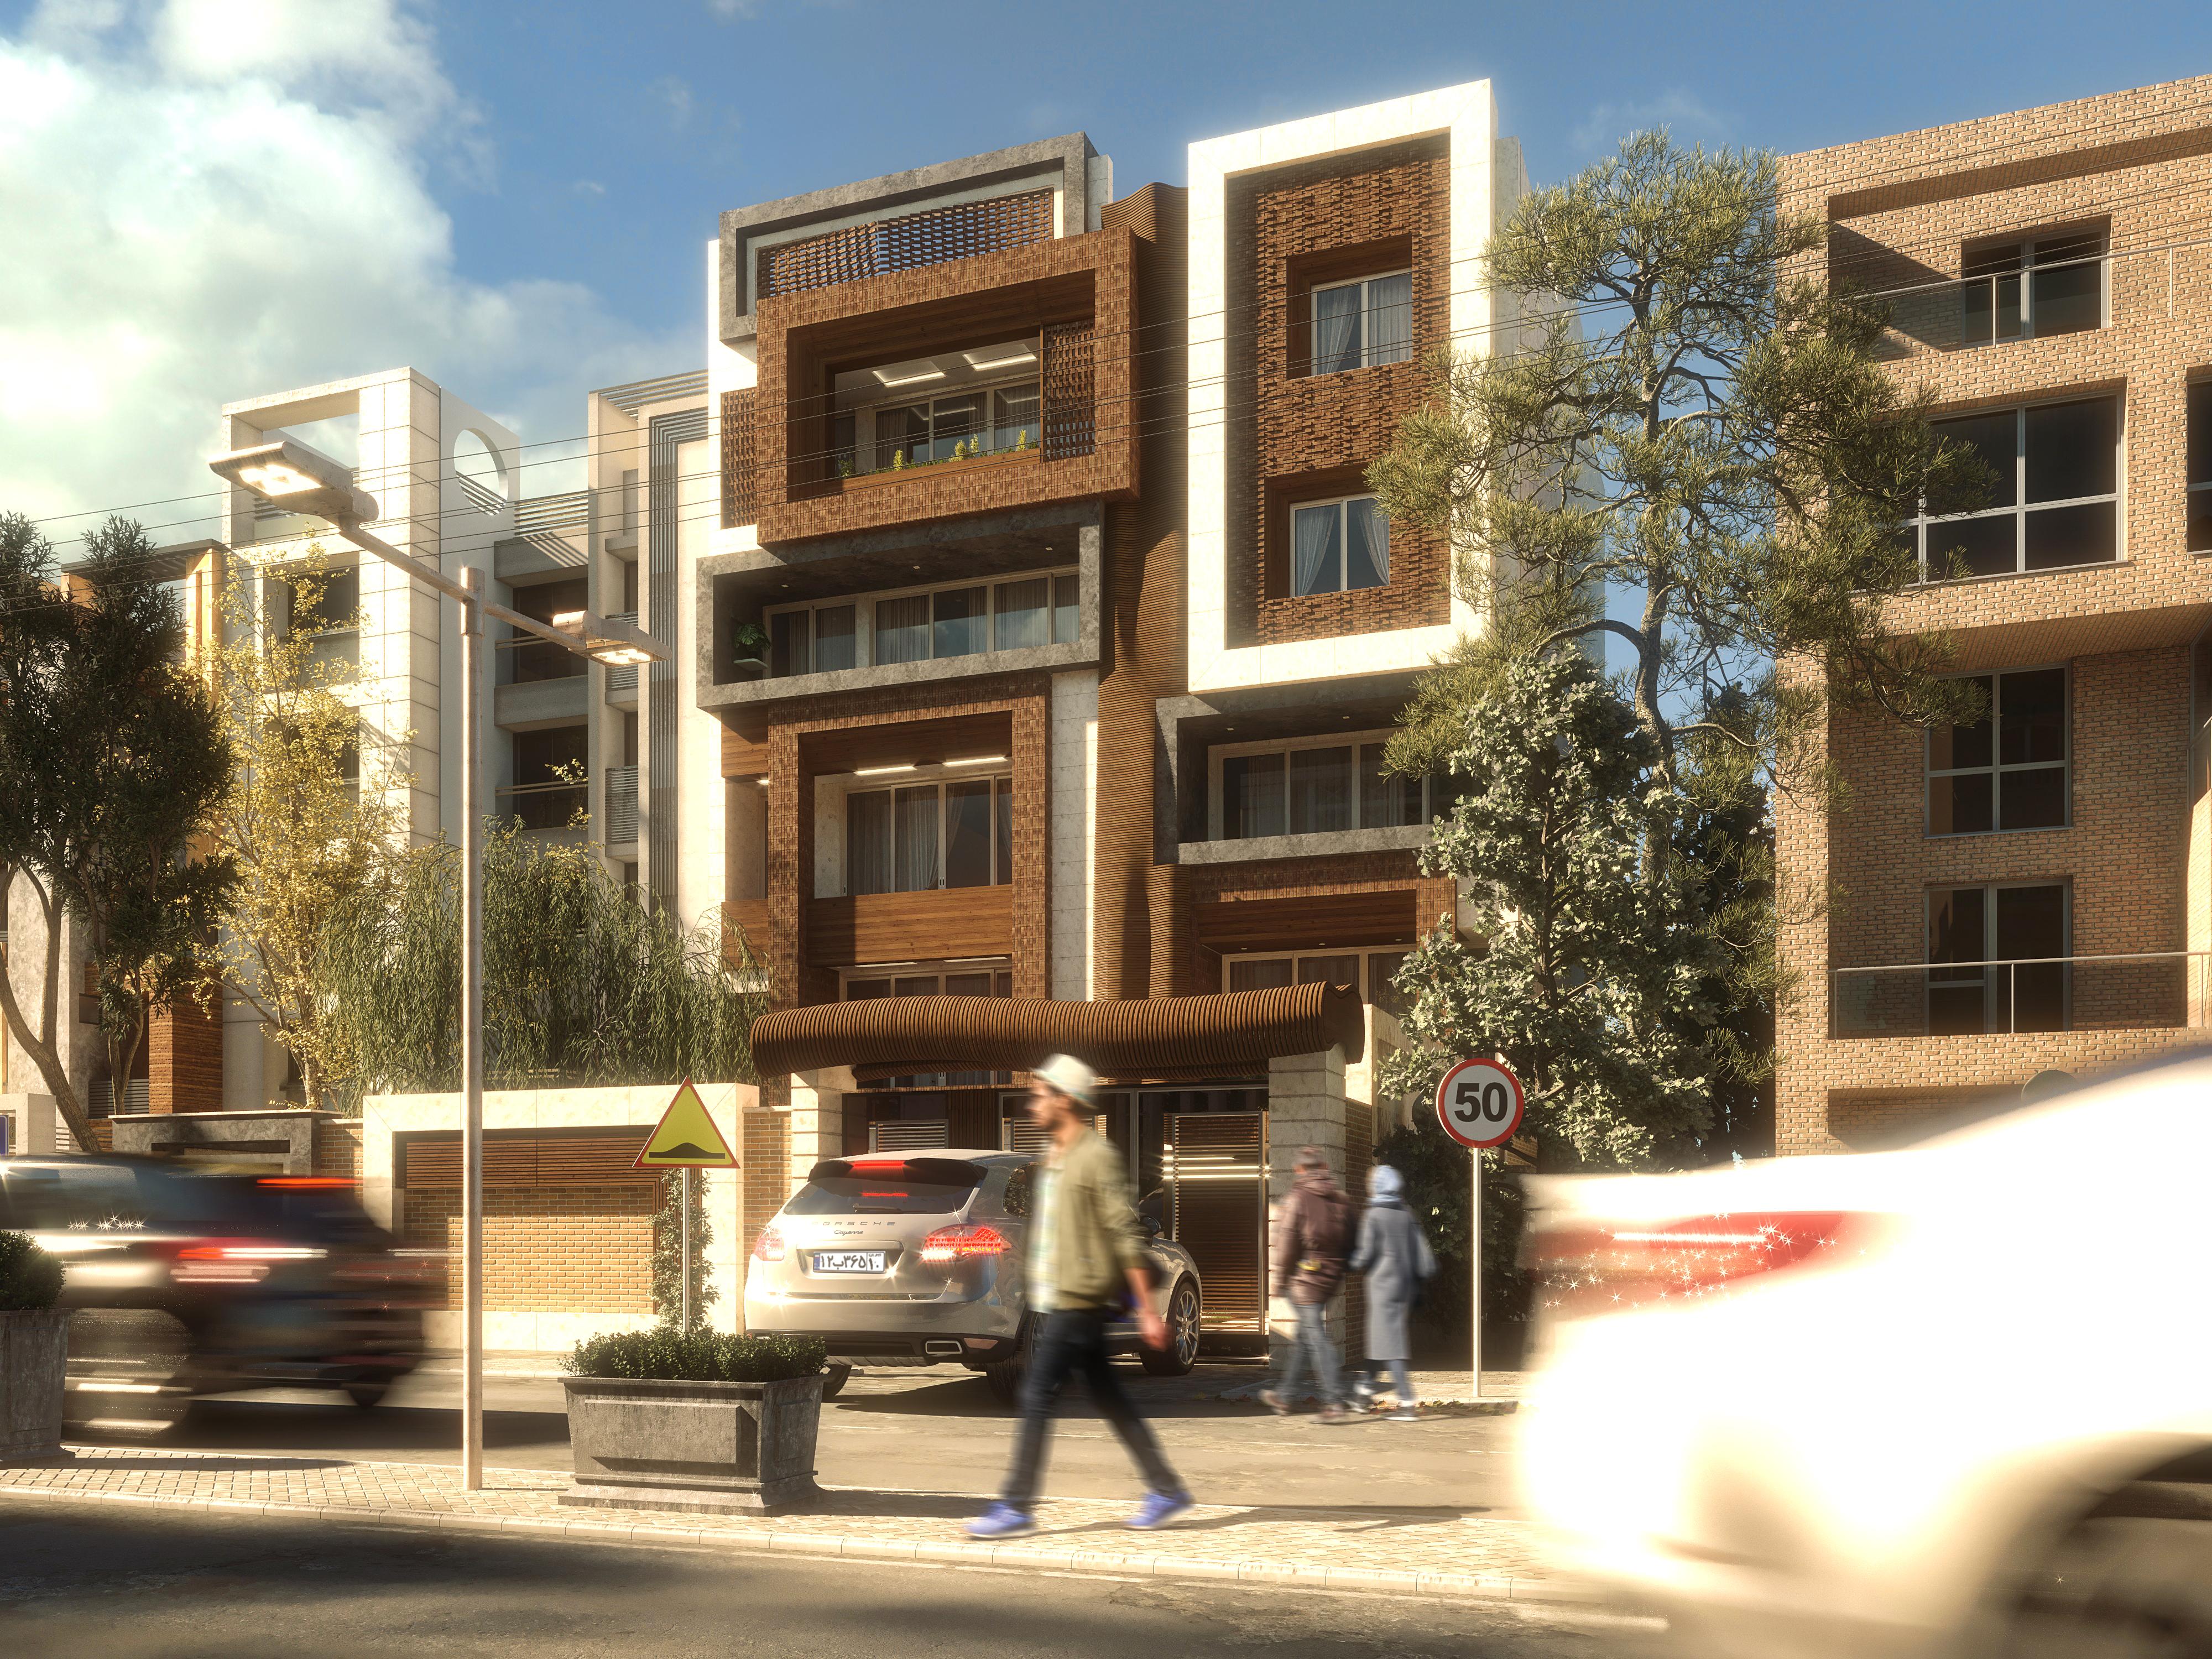 exterior design of Residential building